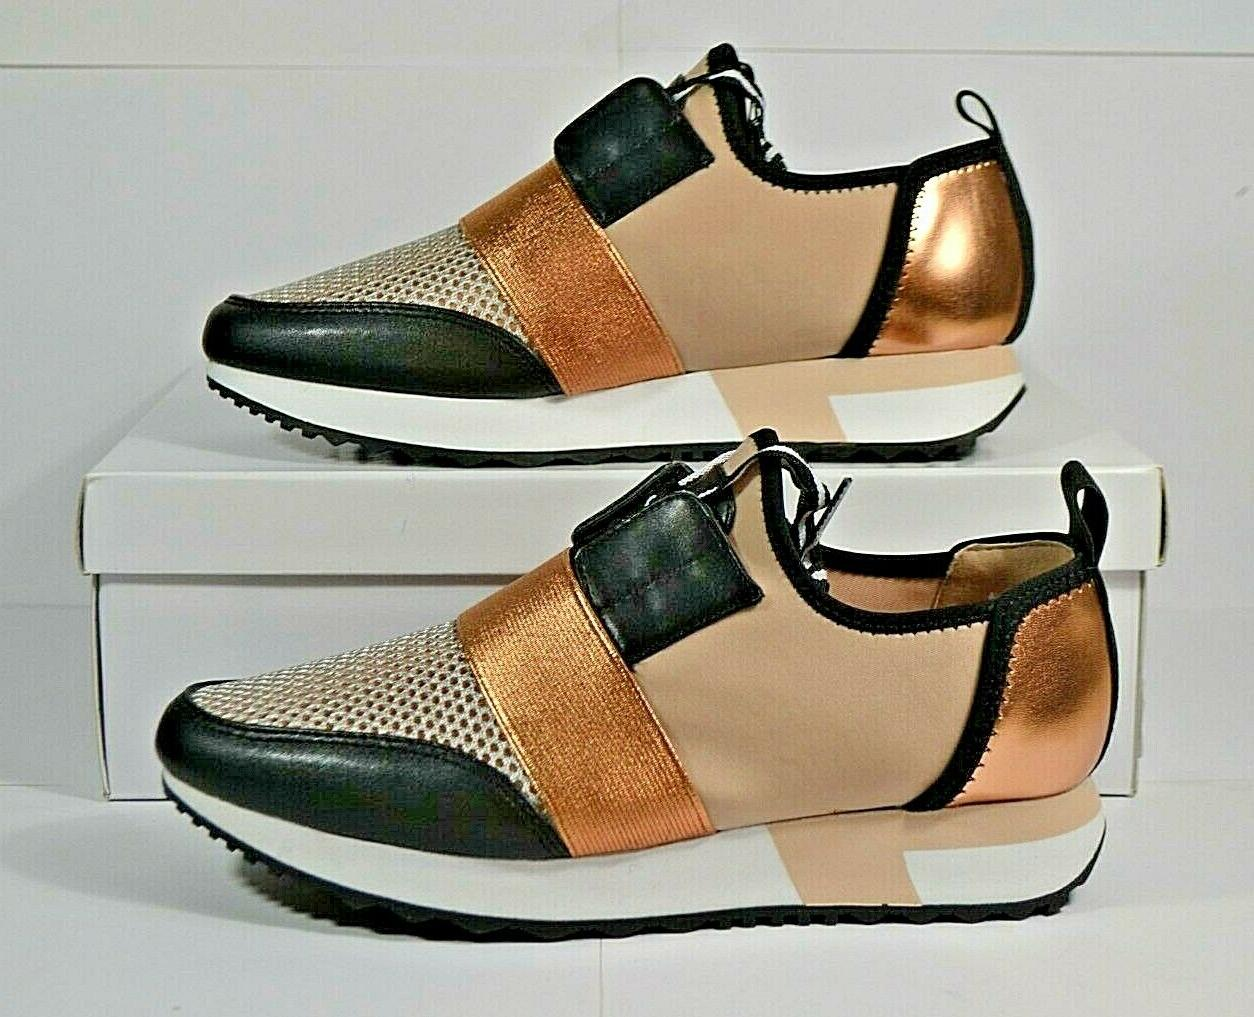 nib womens antics rose gold mesh sneakers